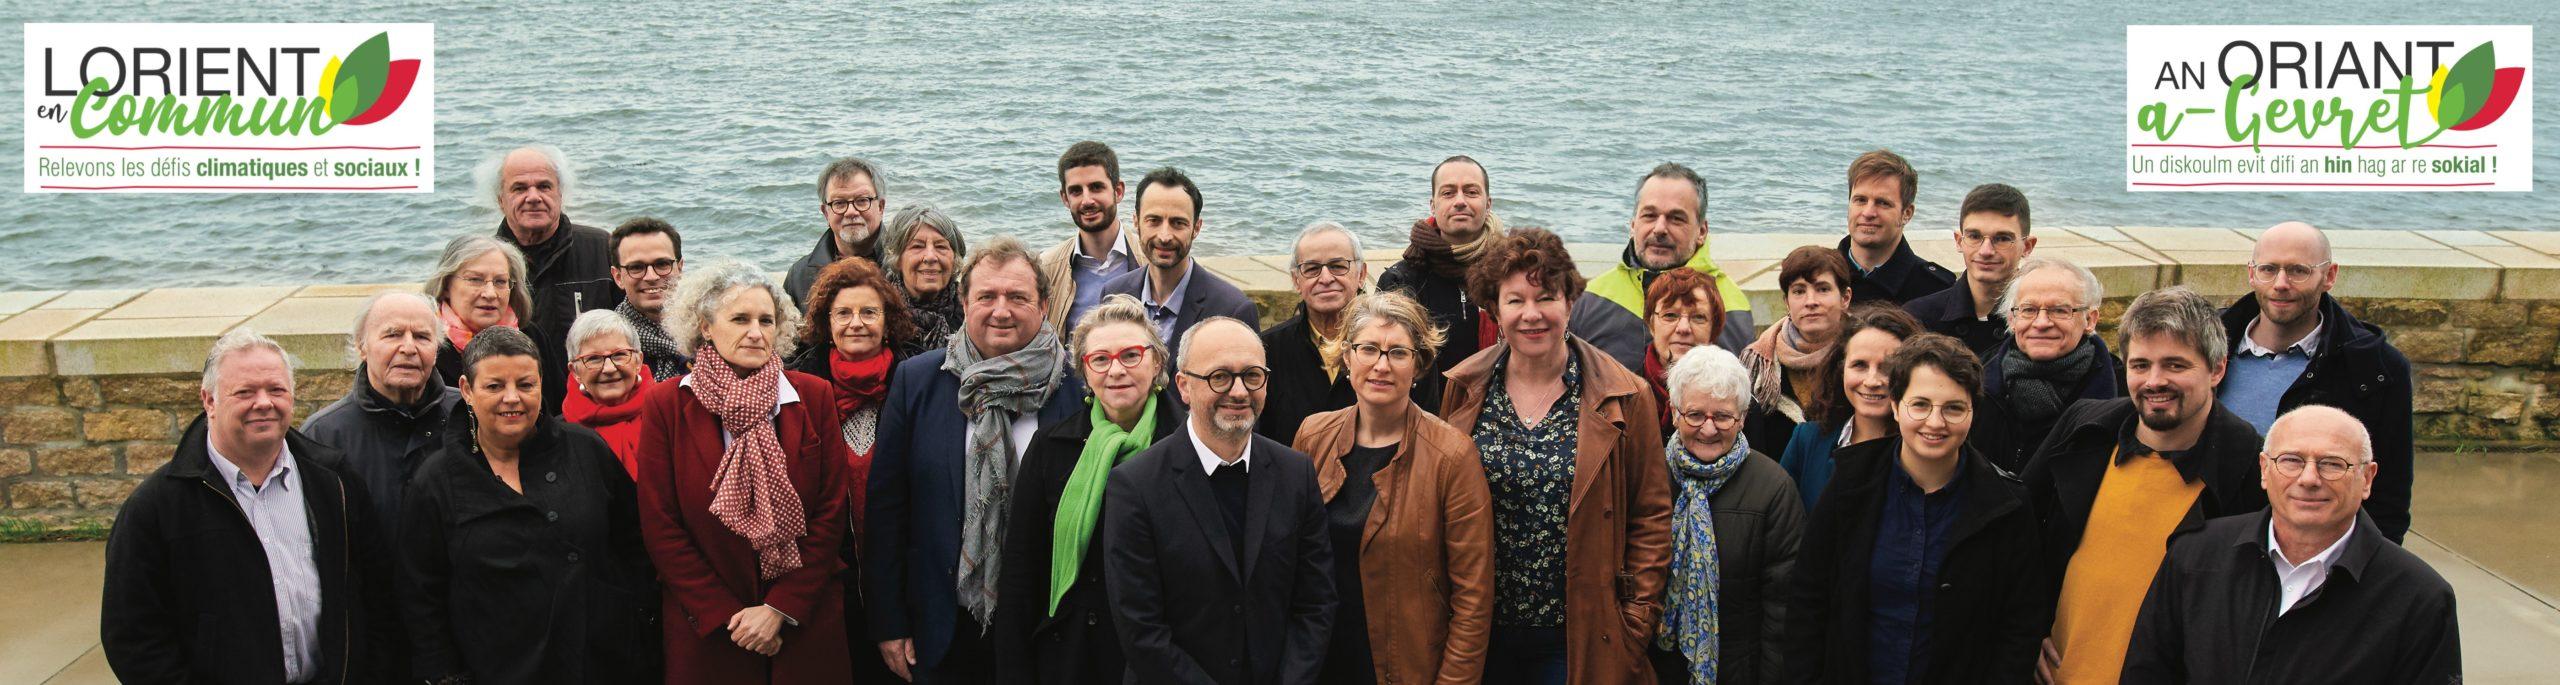 Lorient en commun